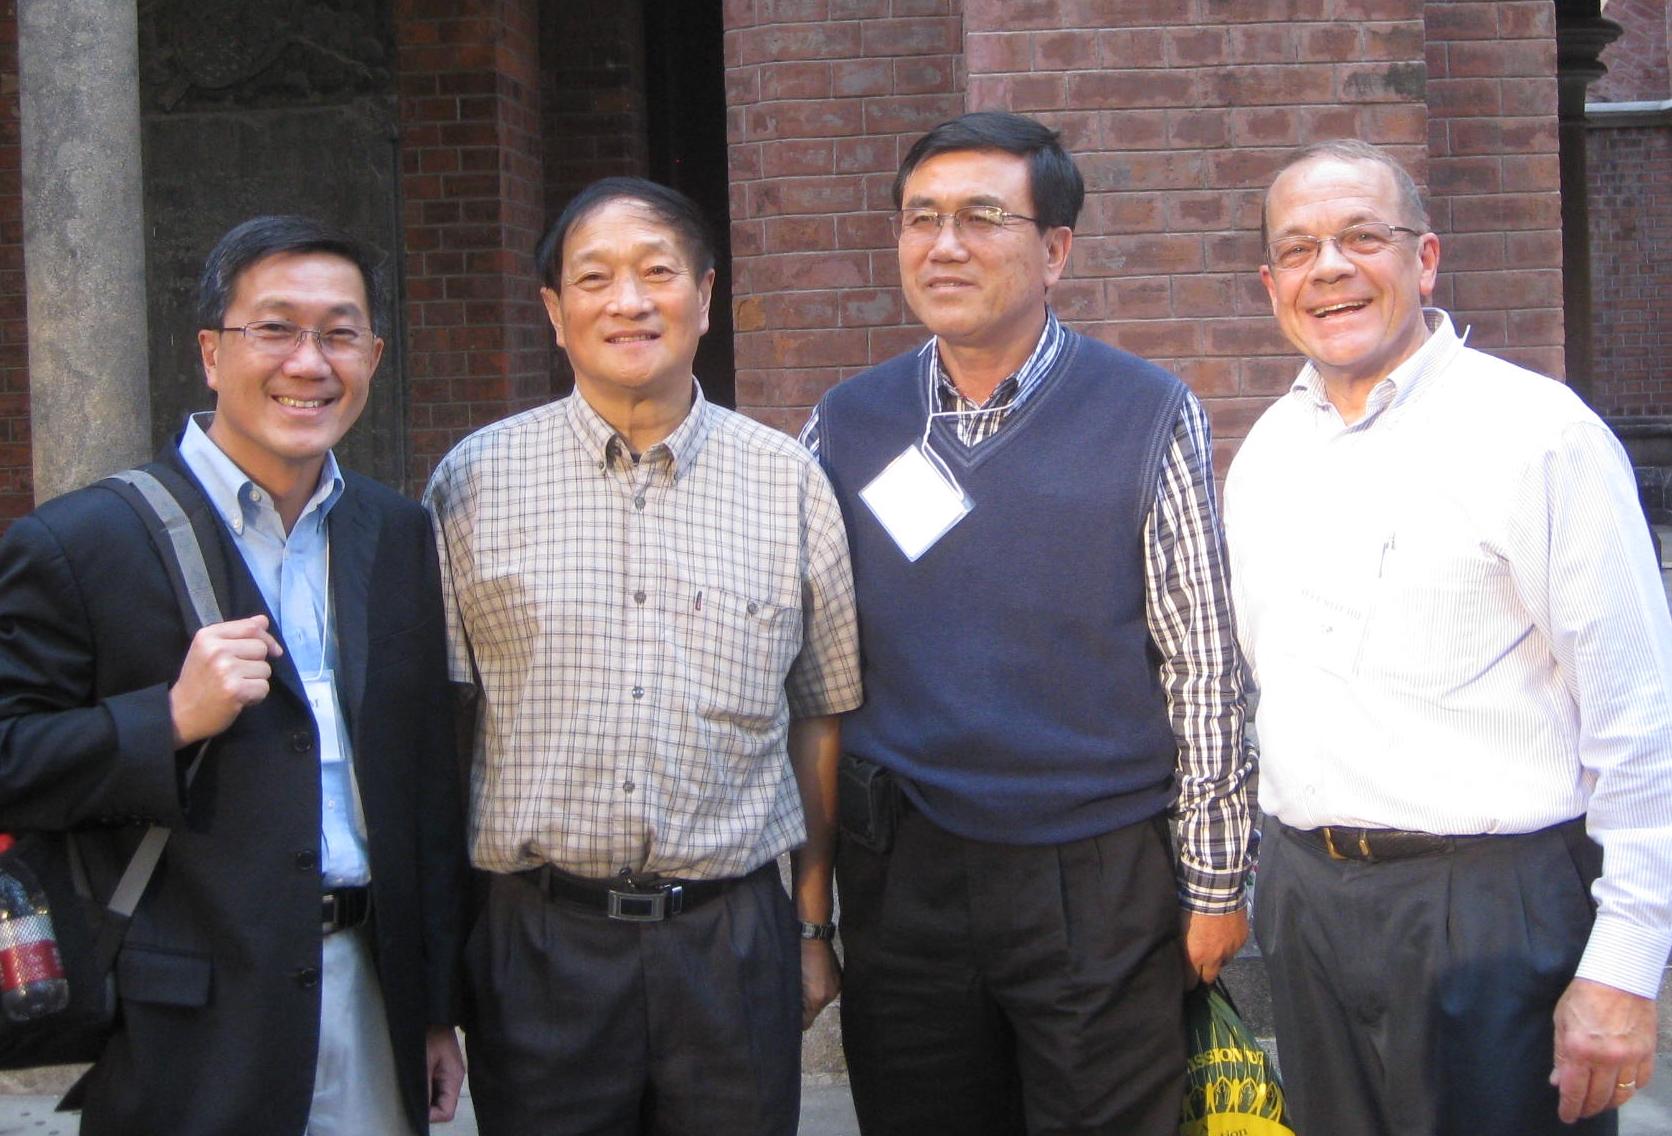 Peter Lim, Rev. Bao, Choon Lim, Jeff Ritchie